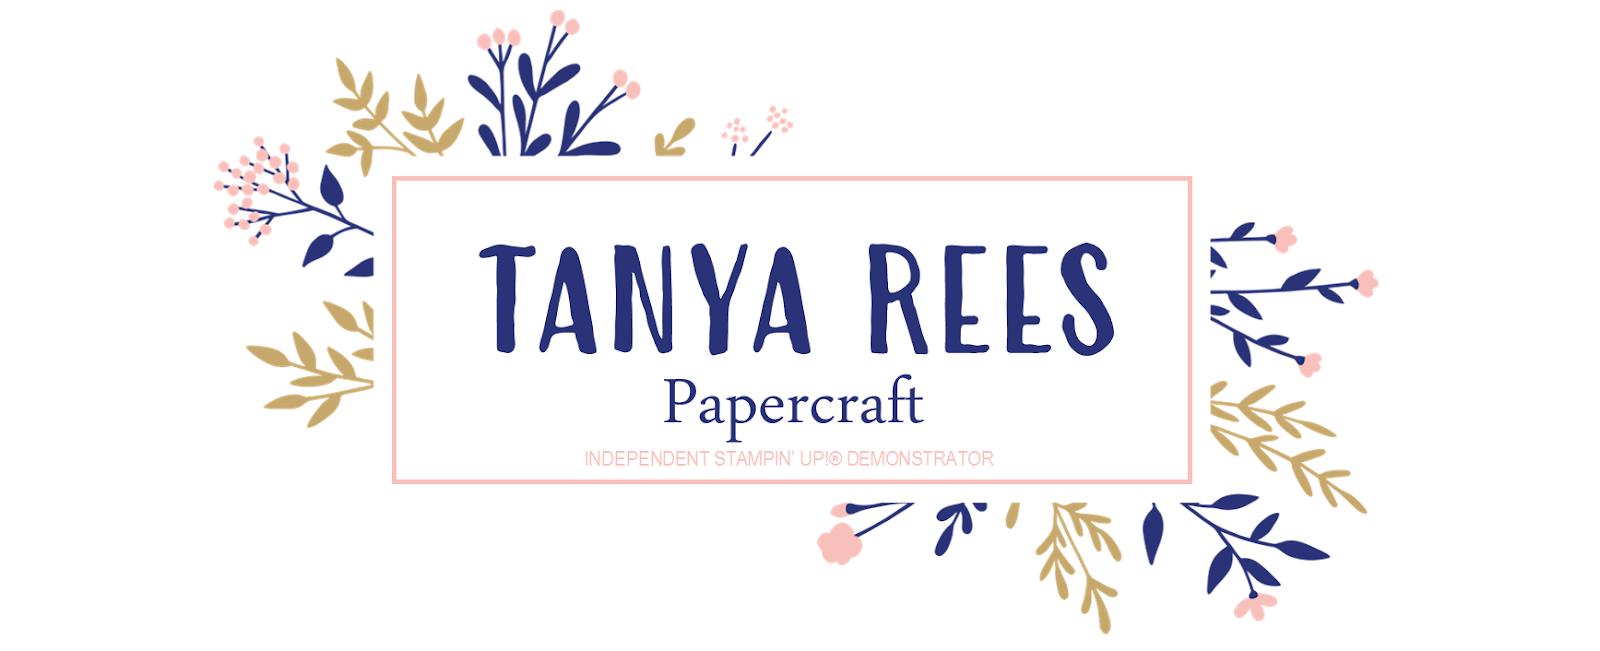 Tanya Rees Papercraft